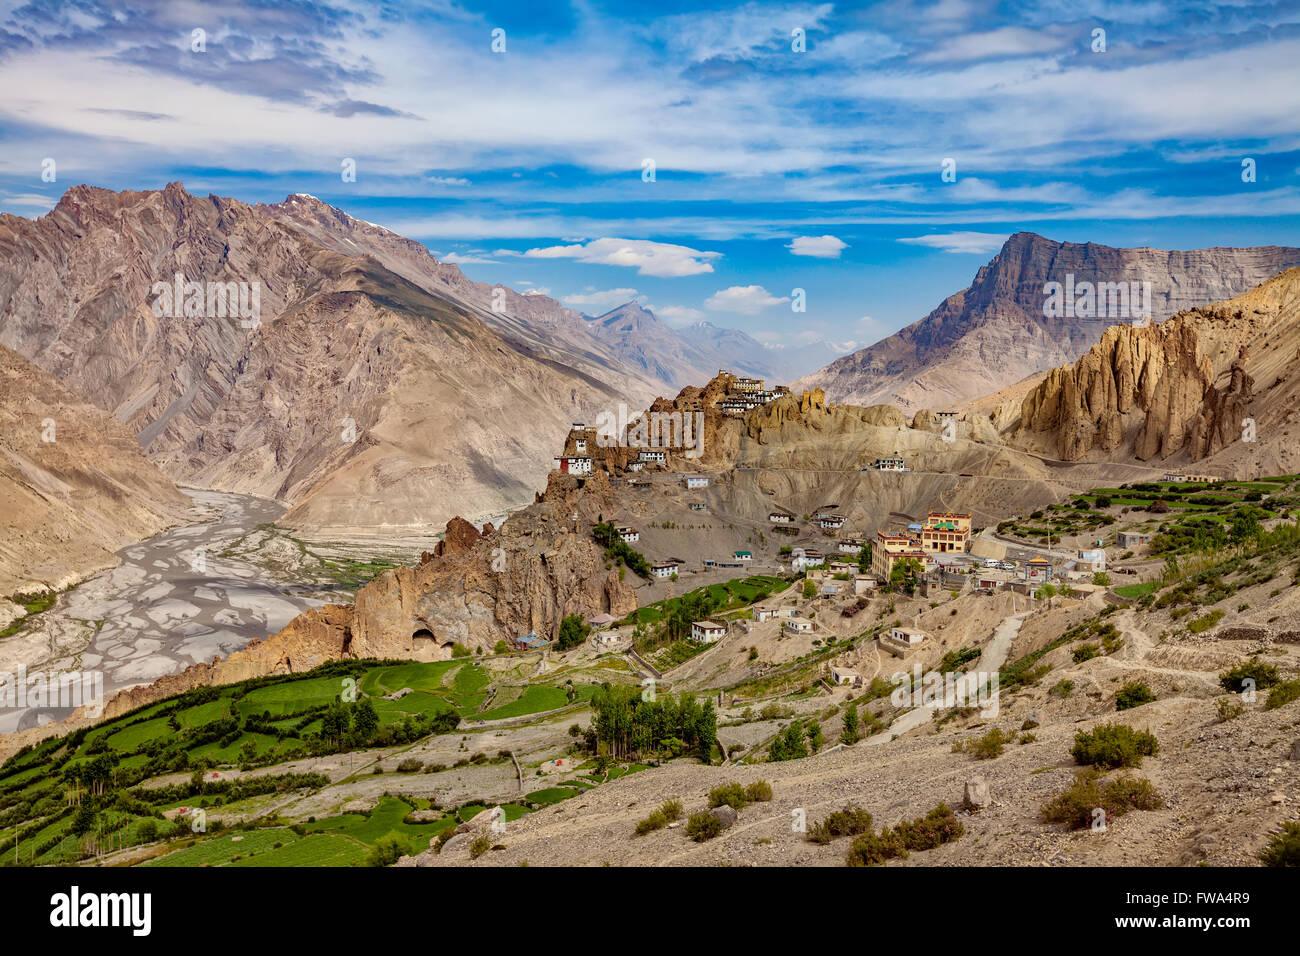 Dhankar gompa. Spiti Valley, Himachal Pradesh, India - Stock Image